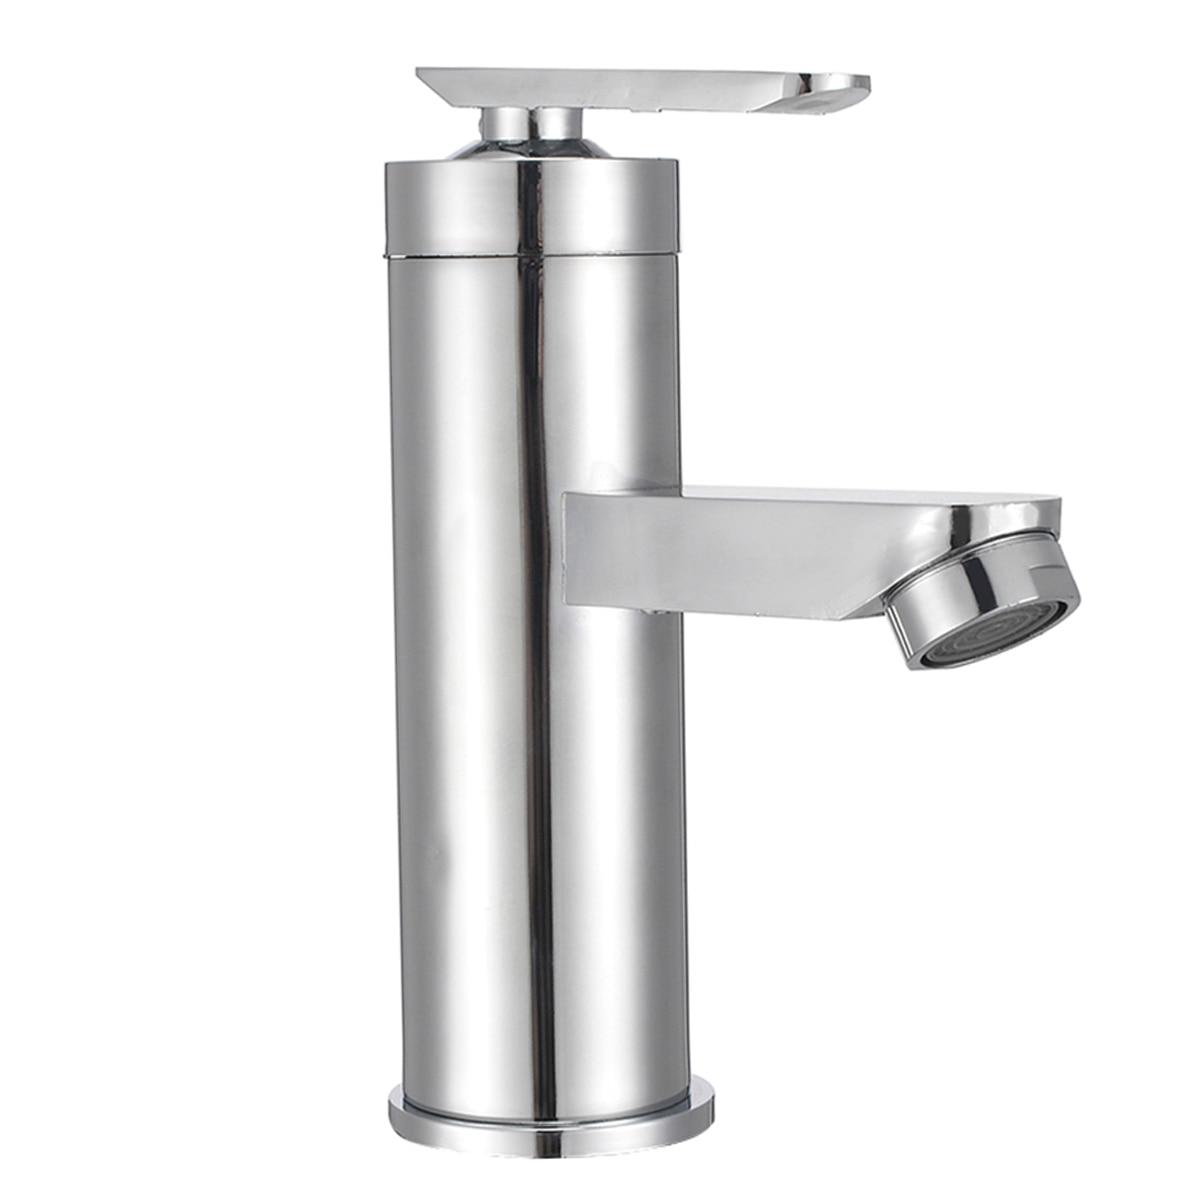 Grifos de lavabo Mayitr, grifo de baño de cascada, grifo mezclador de una manija cromado, grúa de agua del fregadero de baño para accesorios de baño